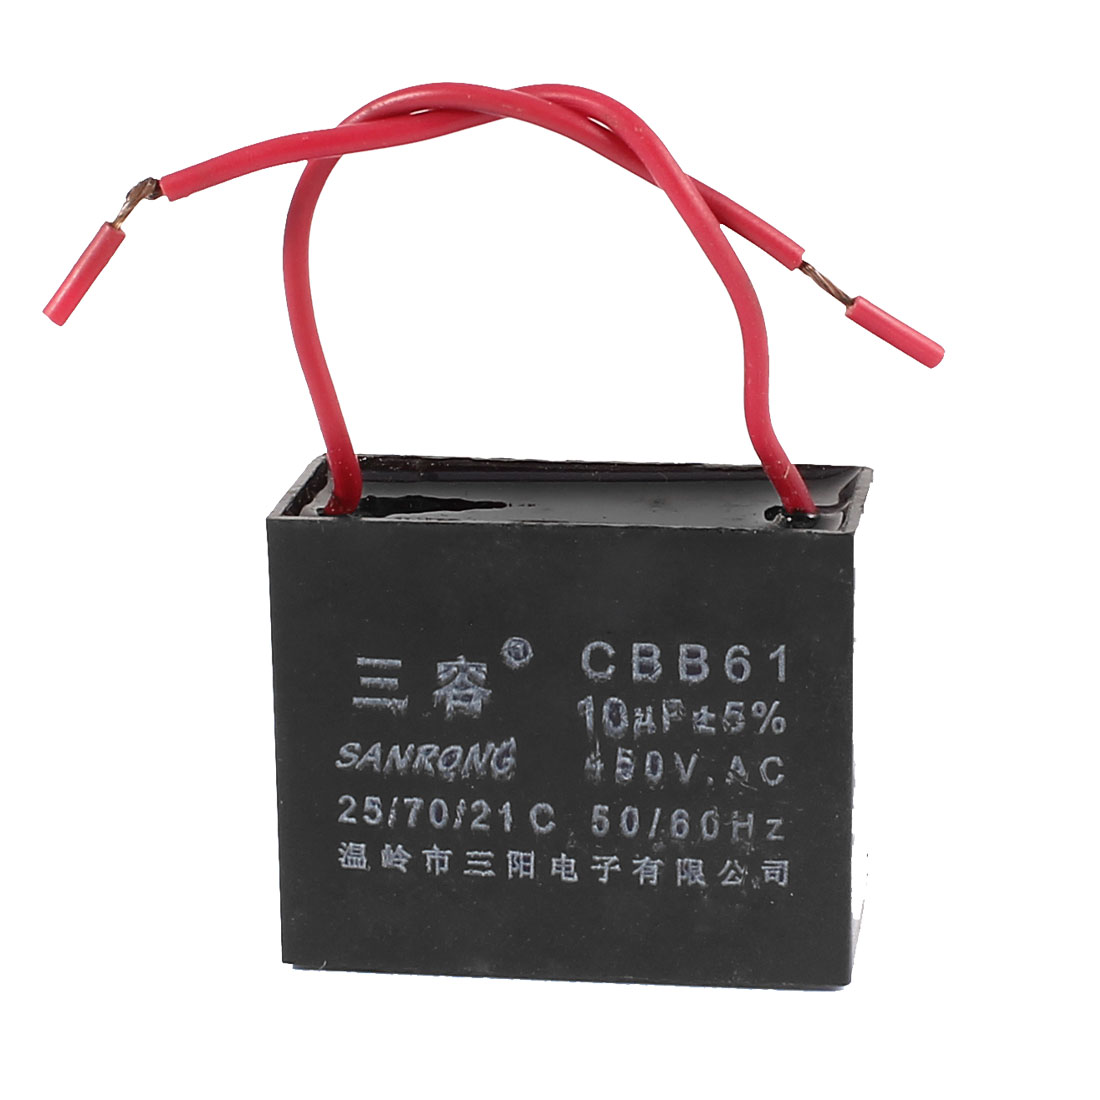 CBB61 450V 10uF Double Wire Leads Rectangle Non Polar AC Motor Run Capacitor